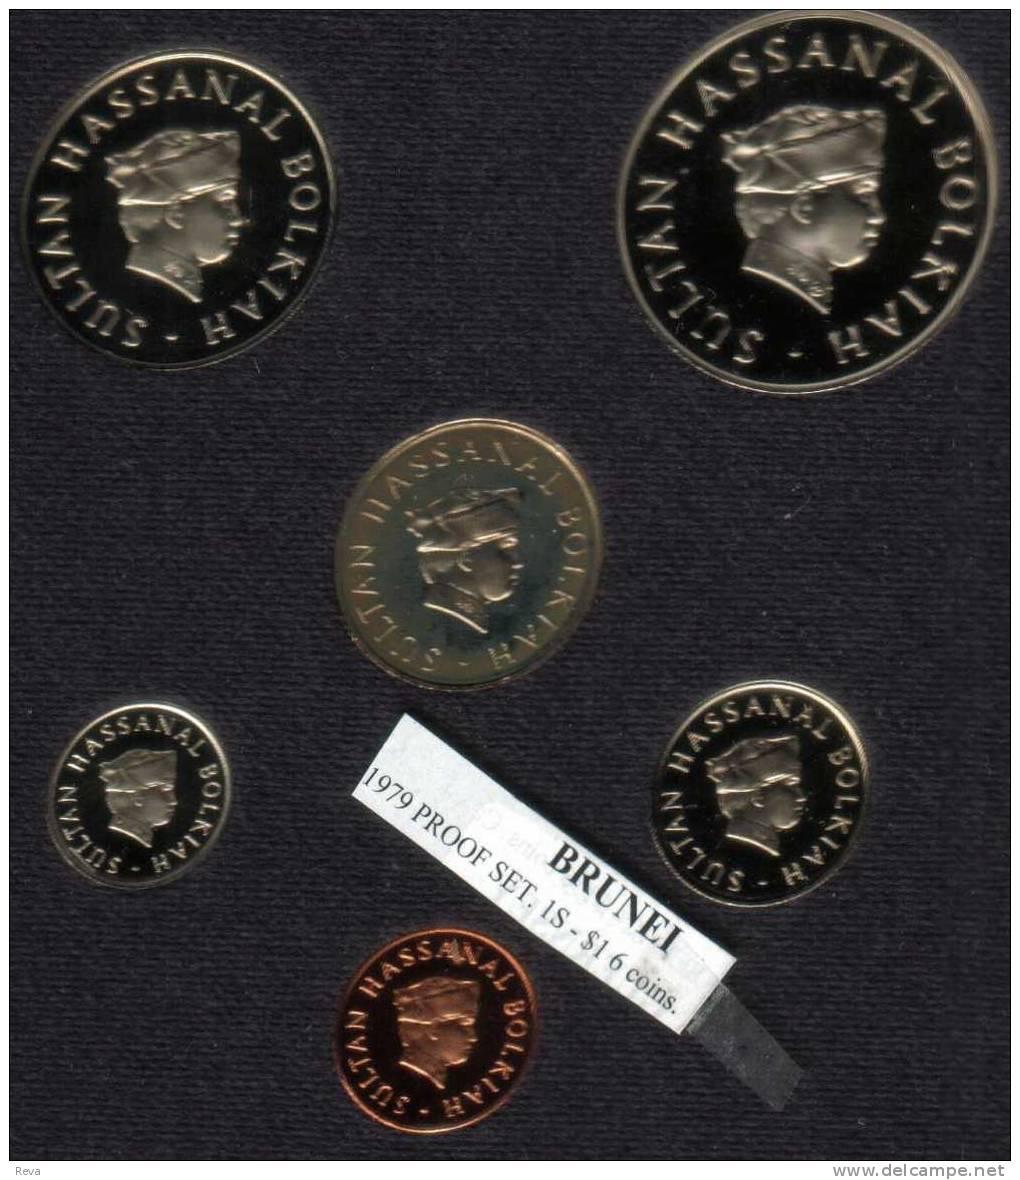 BRUNEI PROOF SET 1 CENT - $1SCARCE  ROYAL INSIGNIA FRONT SULTAN HEAD BACK 1979 PROOF READ DESCRIPTION CAREFULLY!! - Brunei